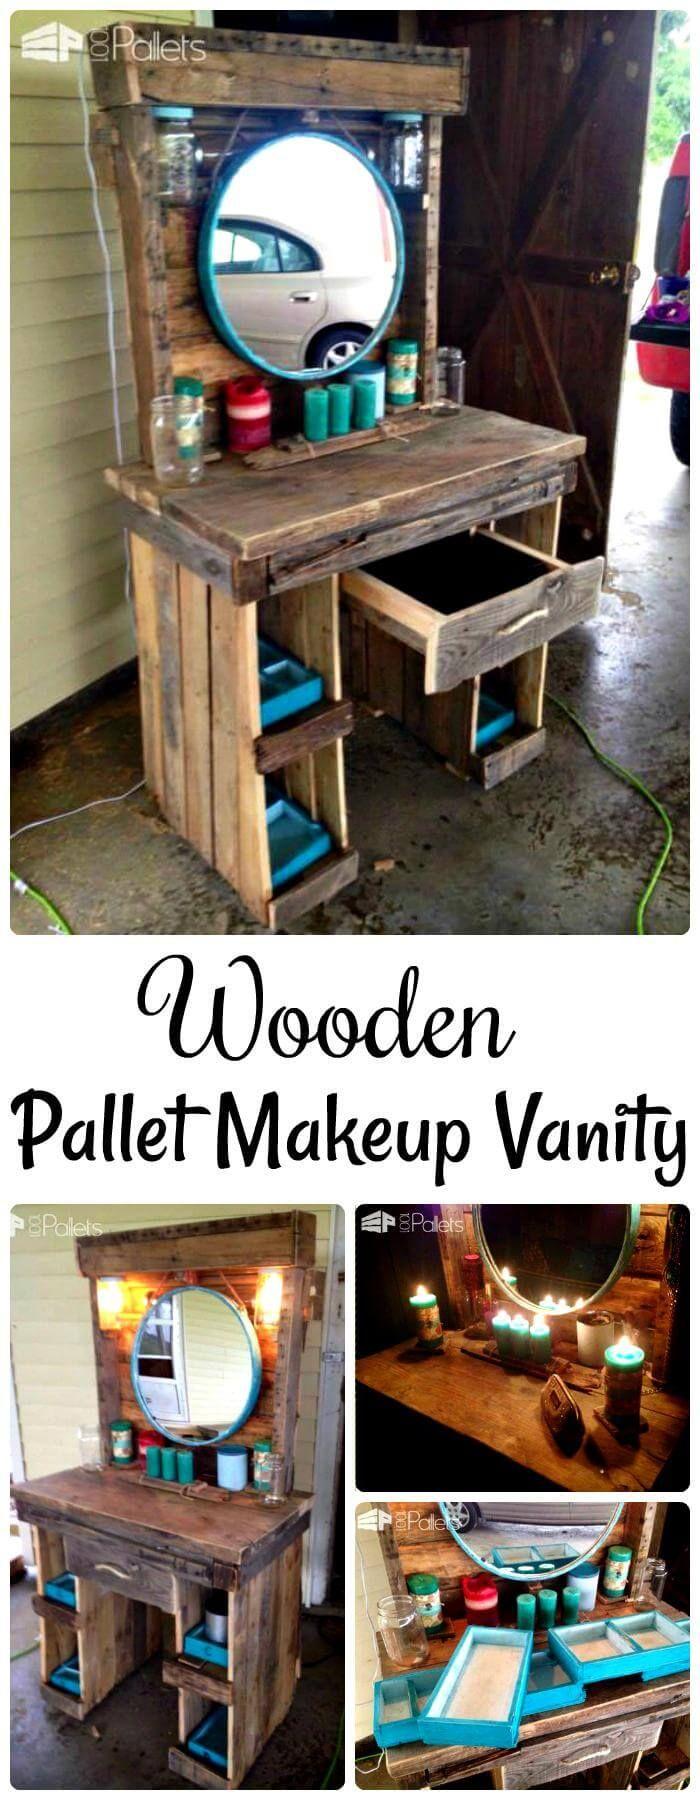 20+ DIY Makeup Vanity Tutorials – DIY Your own Makeup Vanity Table images